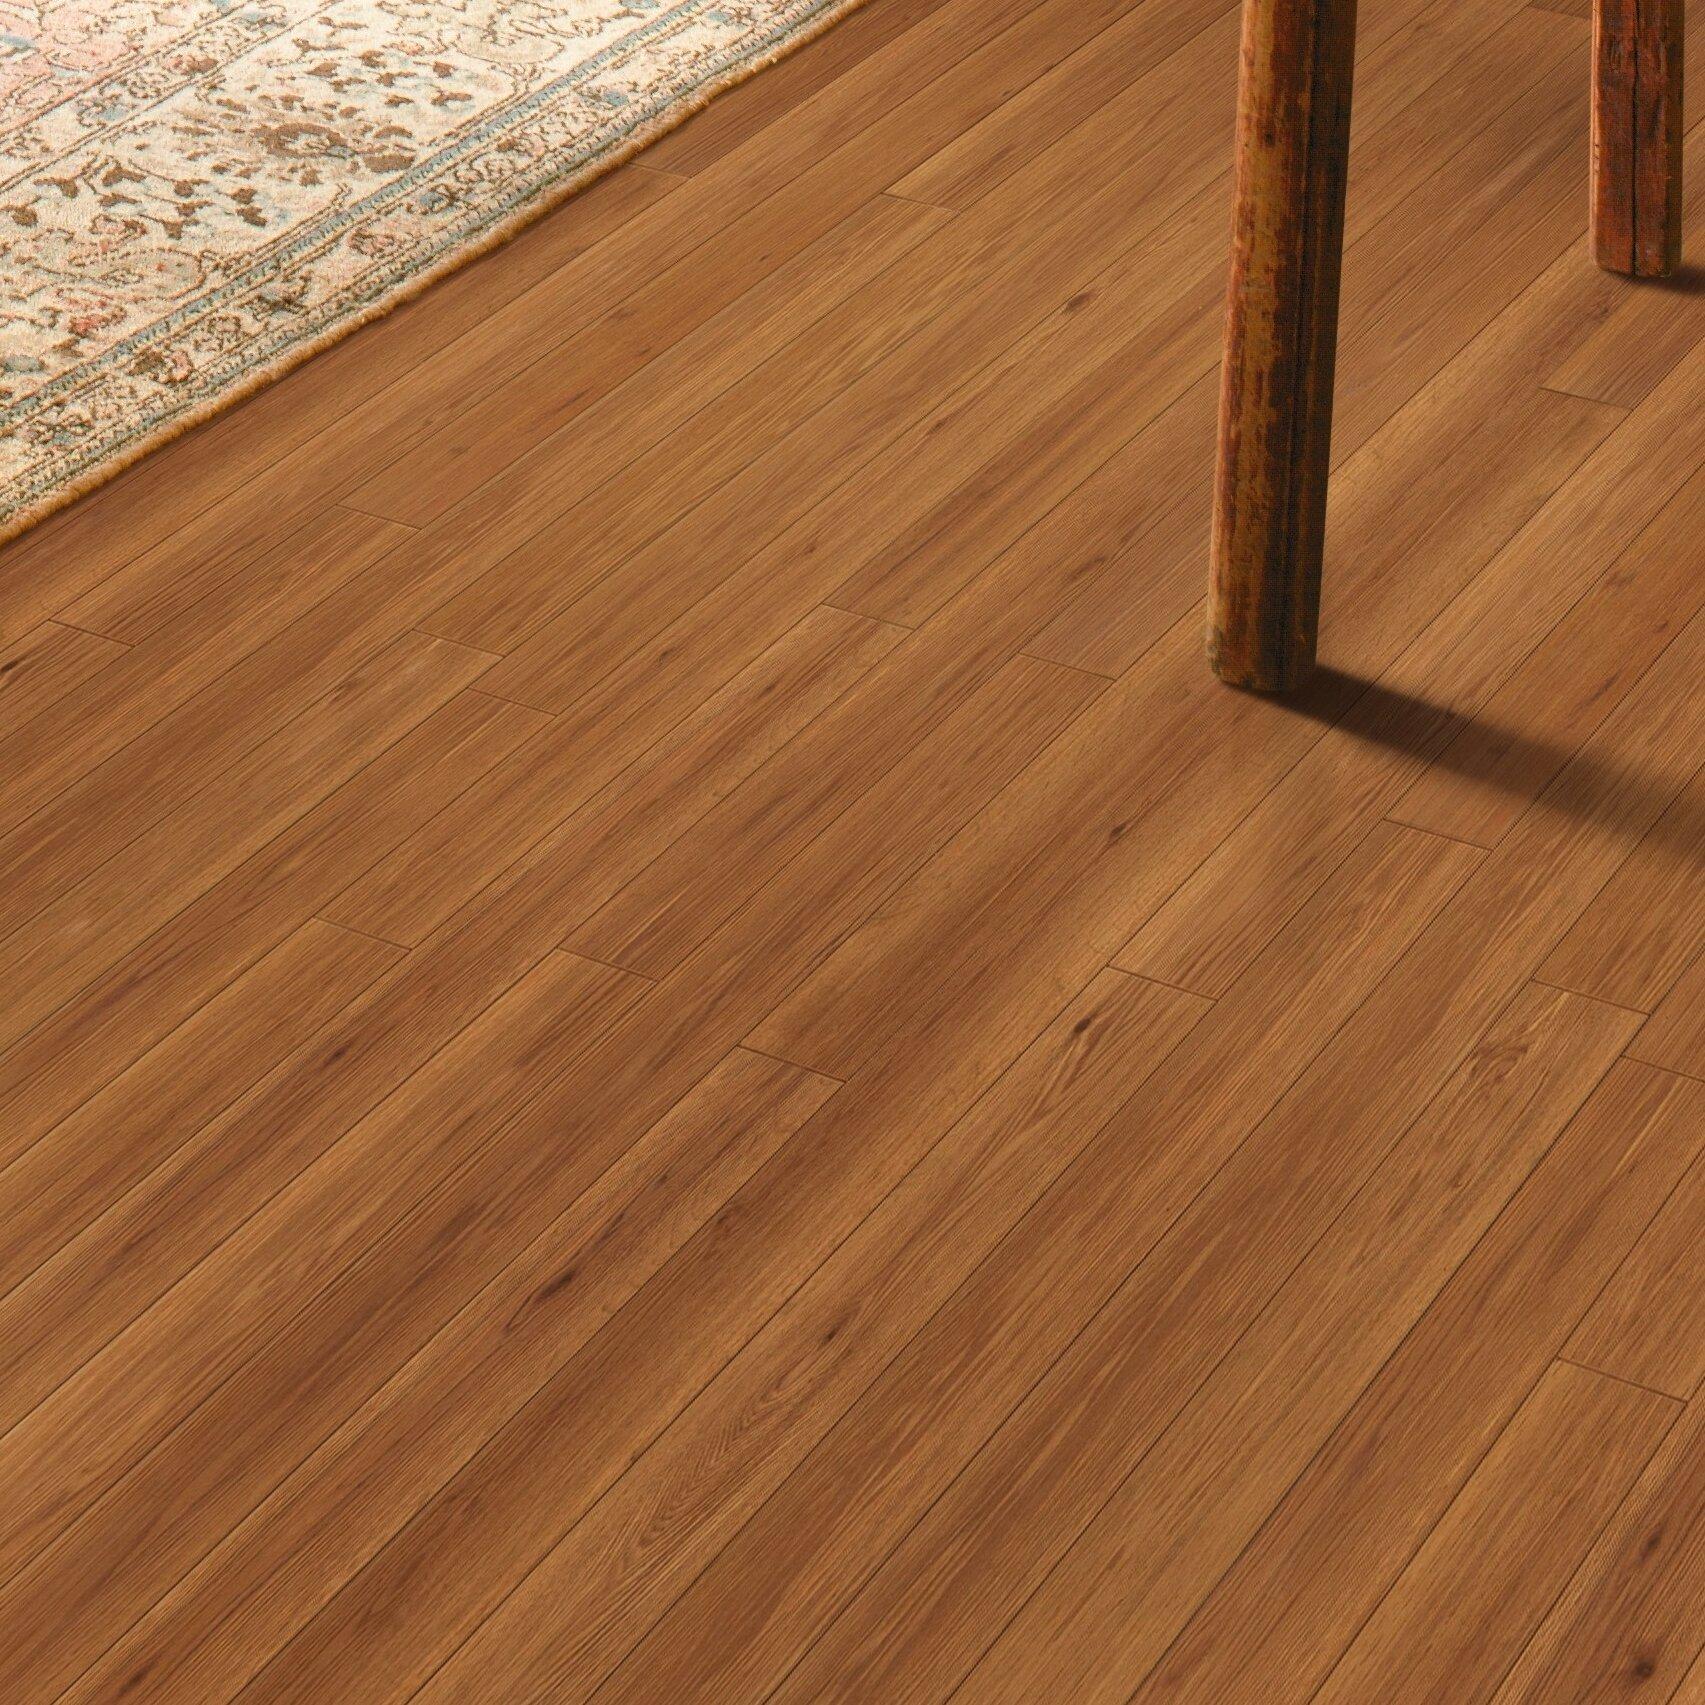 Oak Laminate Flooring wickes sevilla oak laminate flooring mouse over image for a closer look Revolutions Plank 5 X 51 X 8mm Ontario Oak Laminate In Gunstock